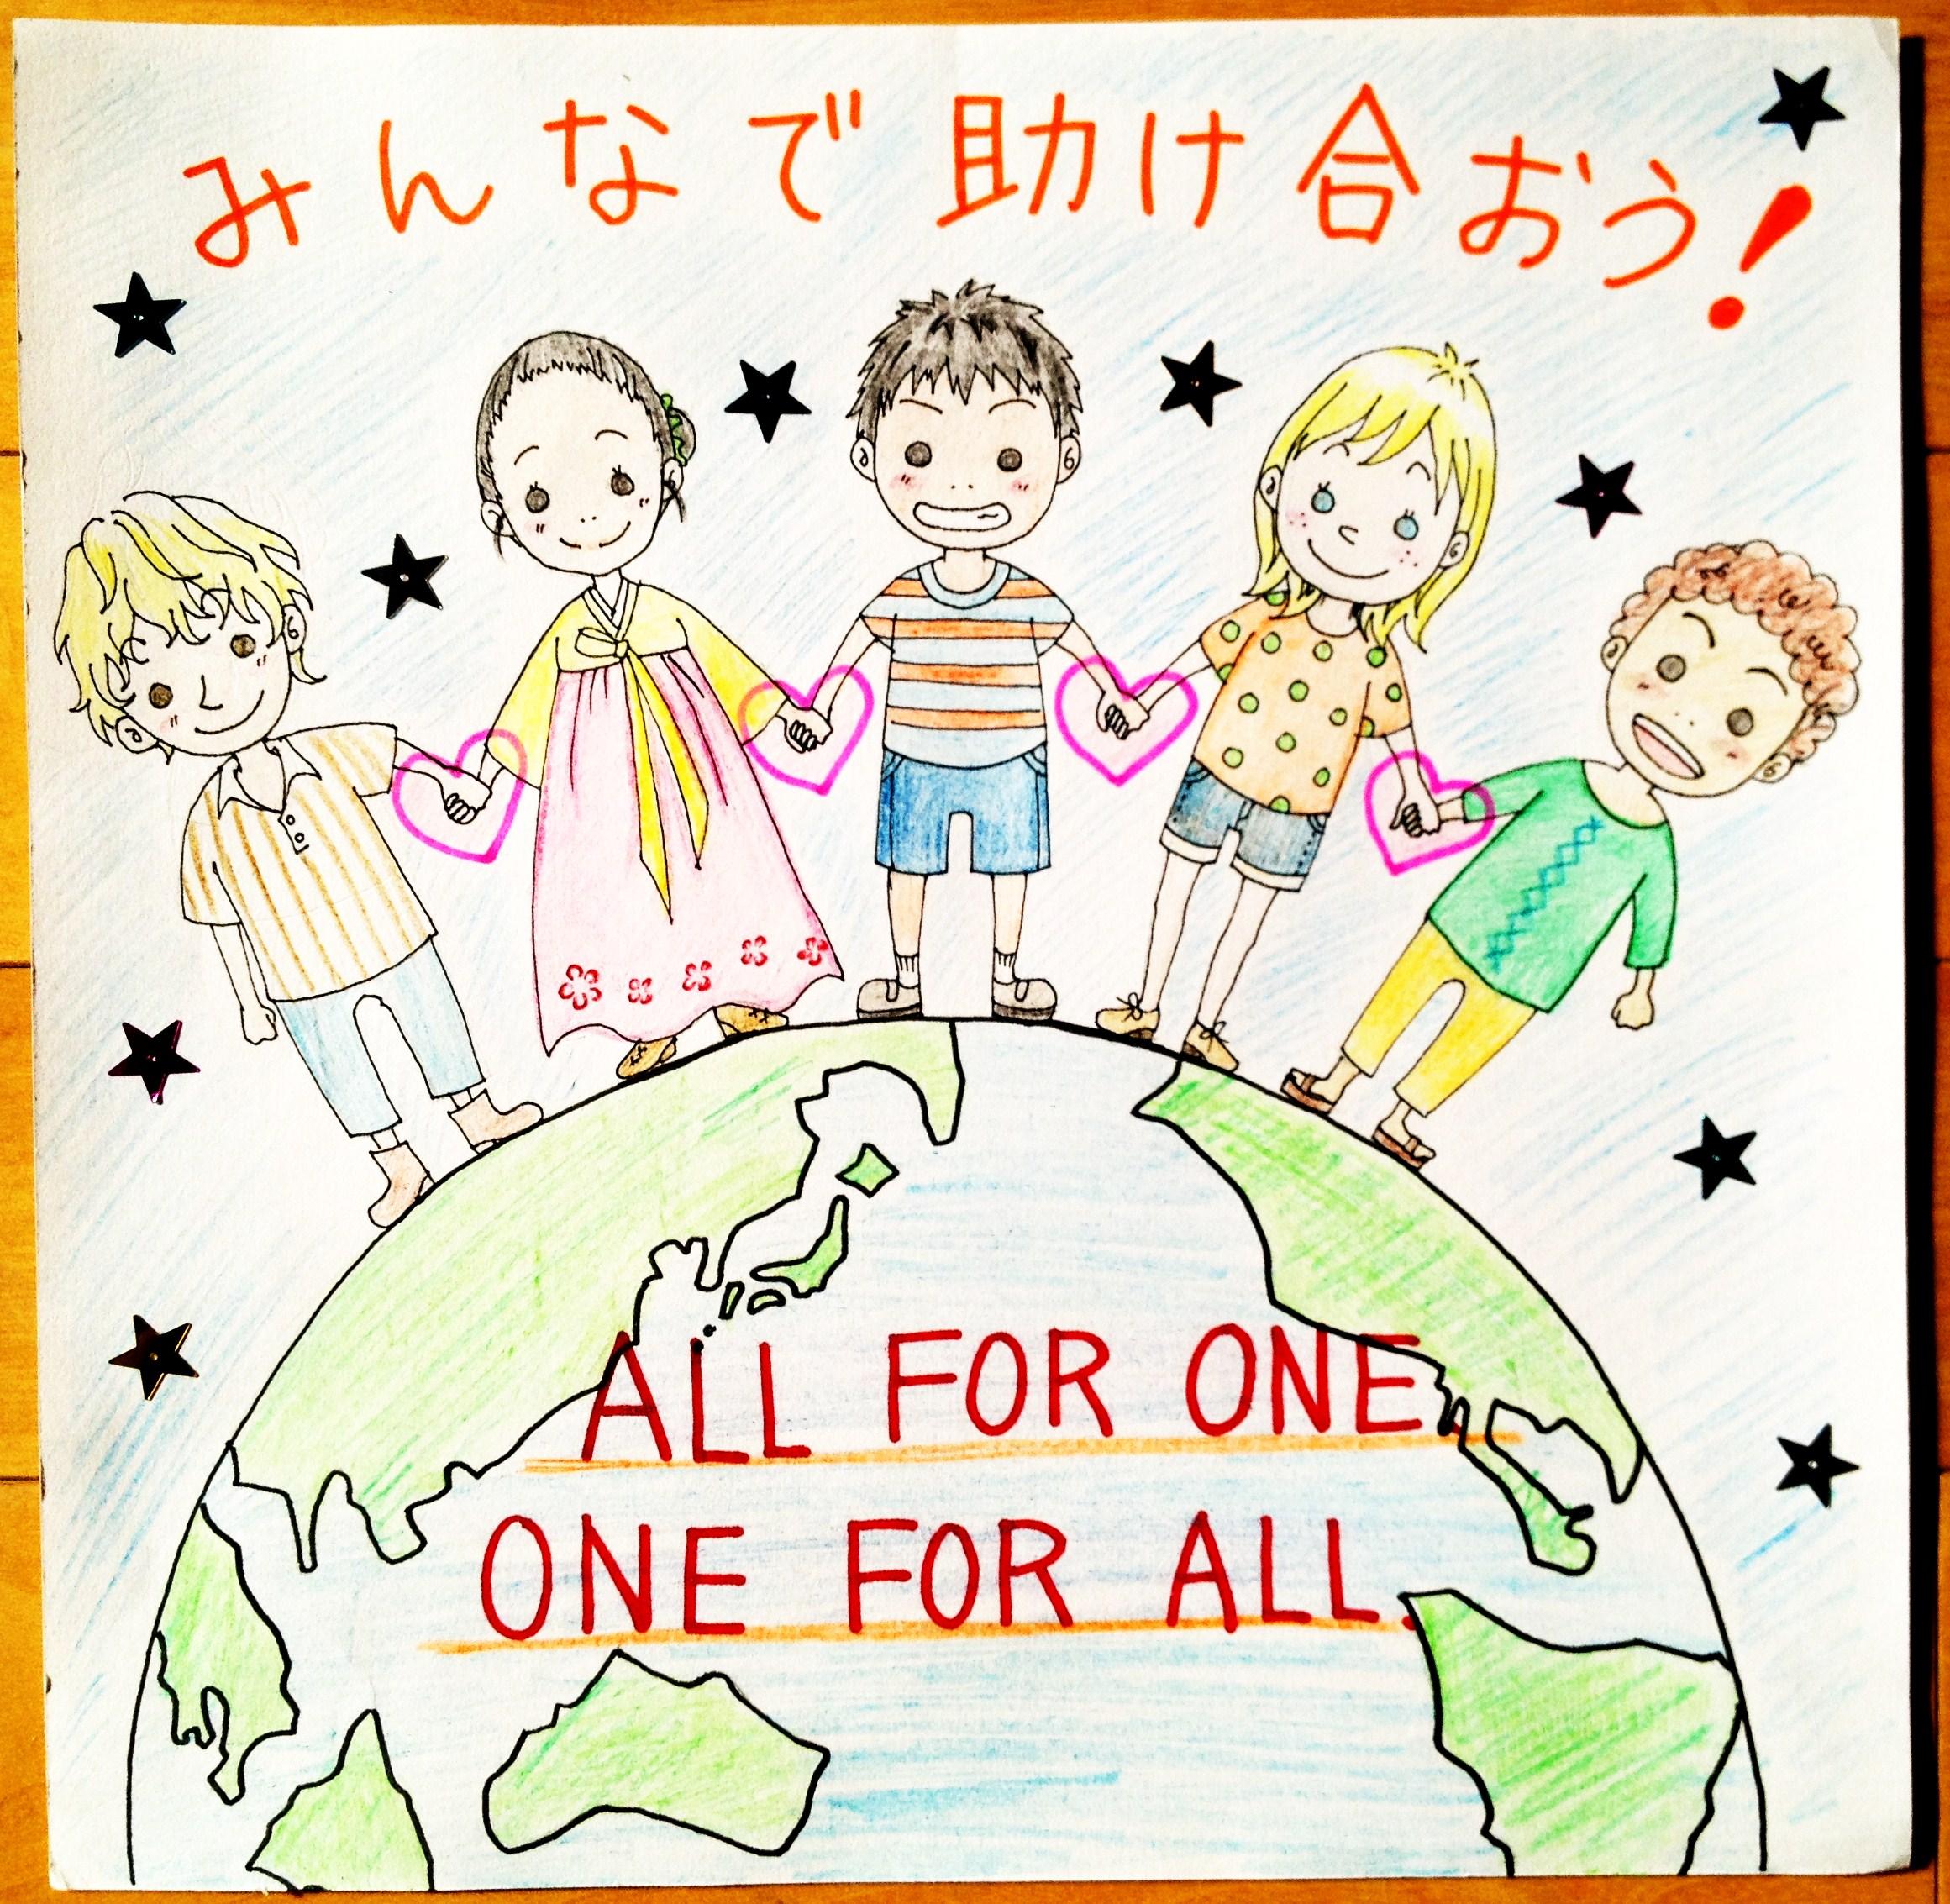 everyone-helping-each-otherefbc81.jpg